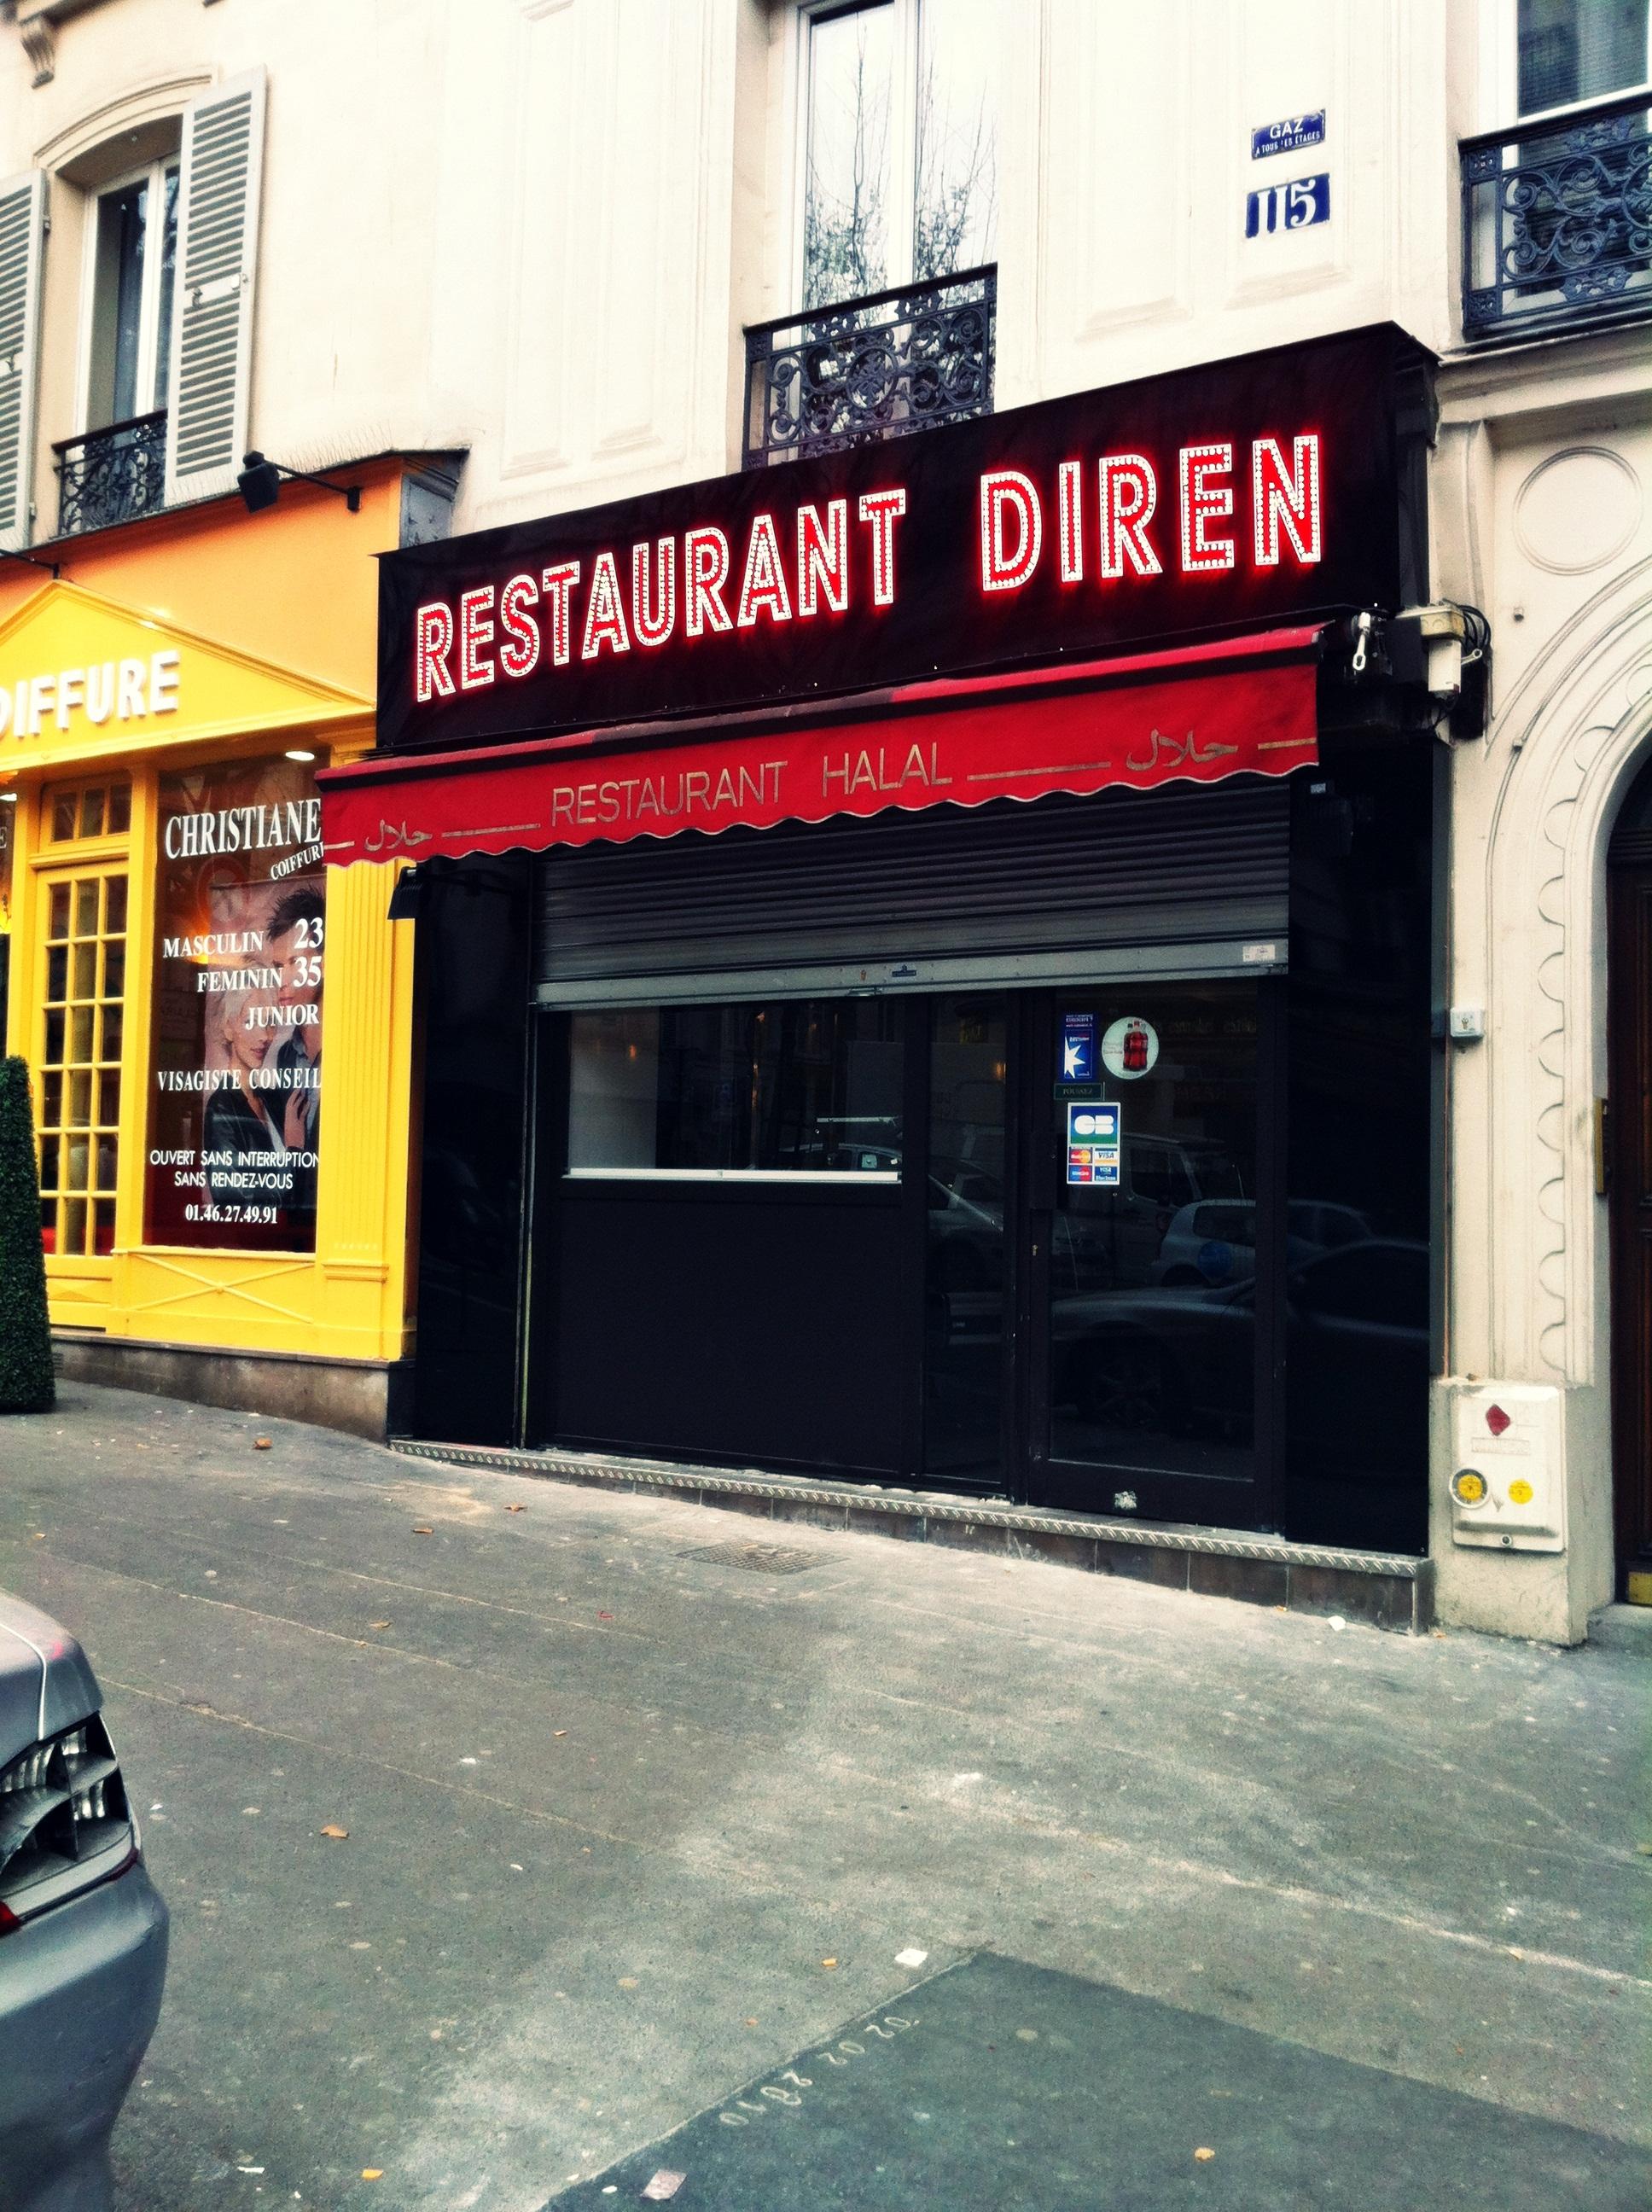 Restaurant Diren